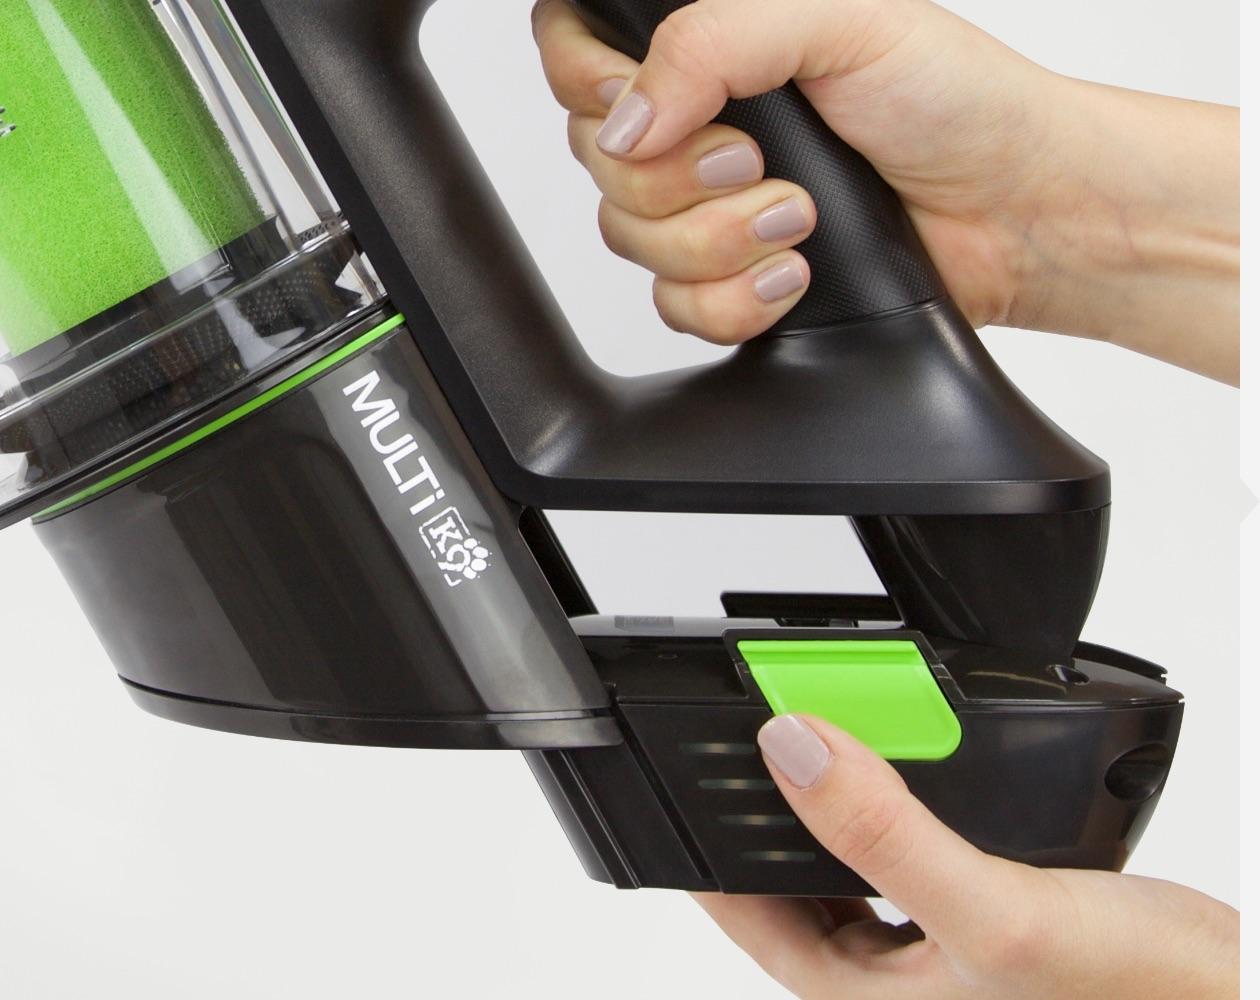 Multi K9 handheld vacuum cleaner long runtime